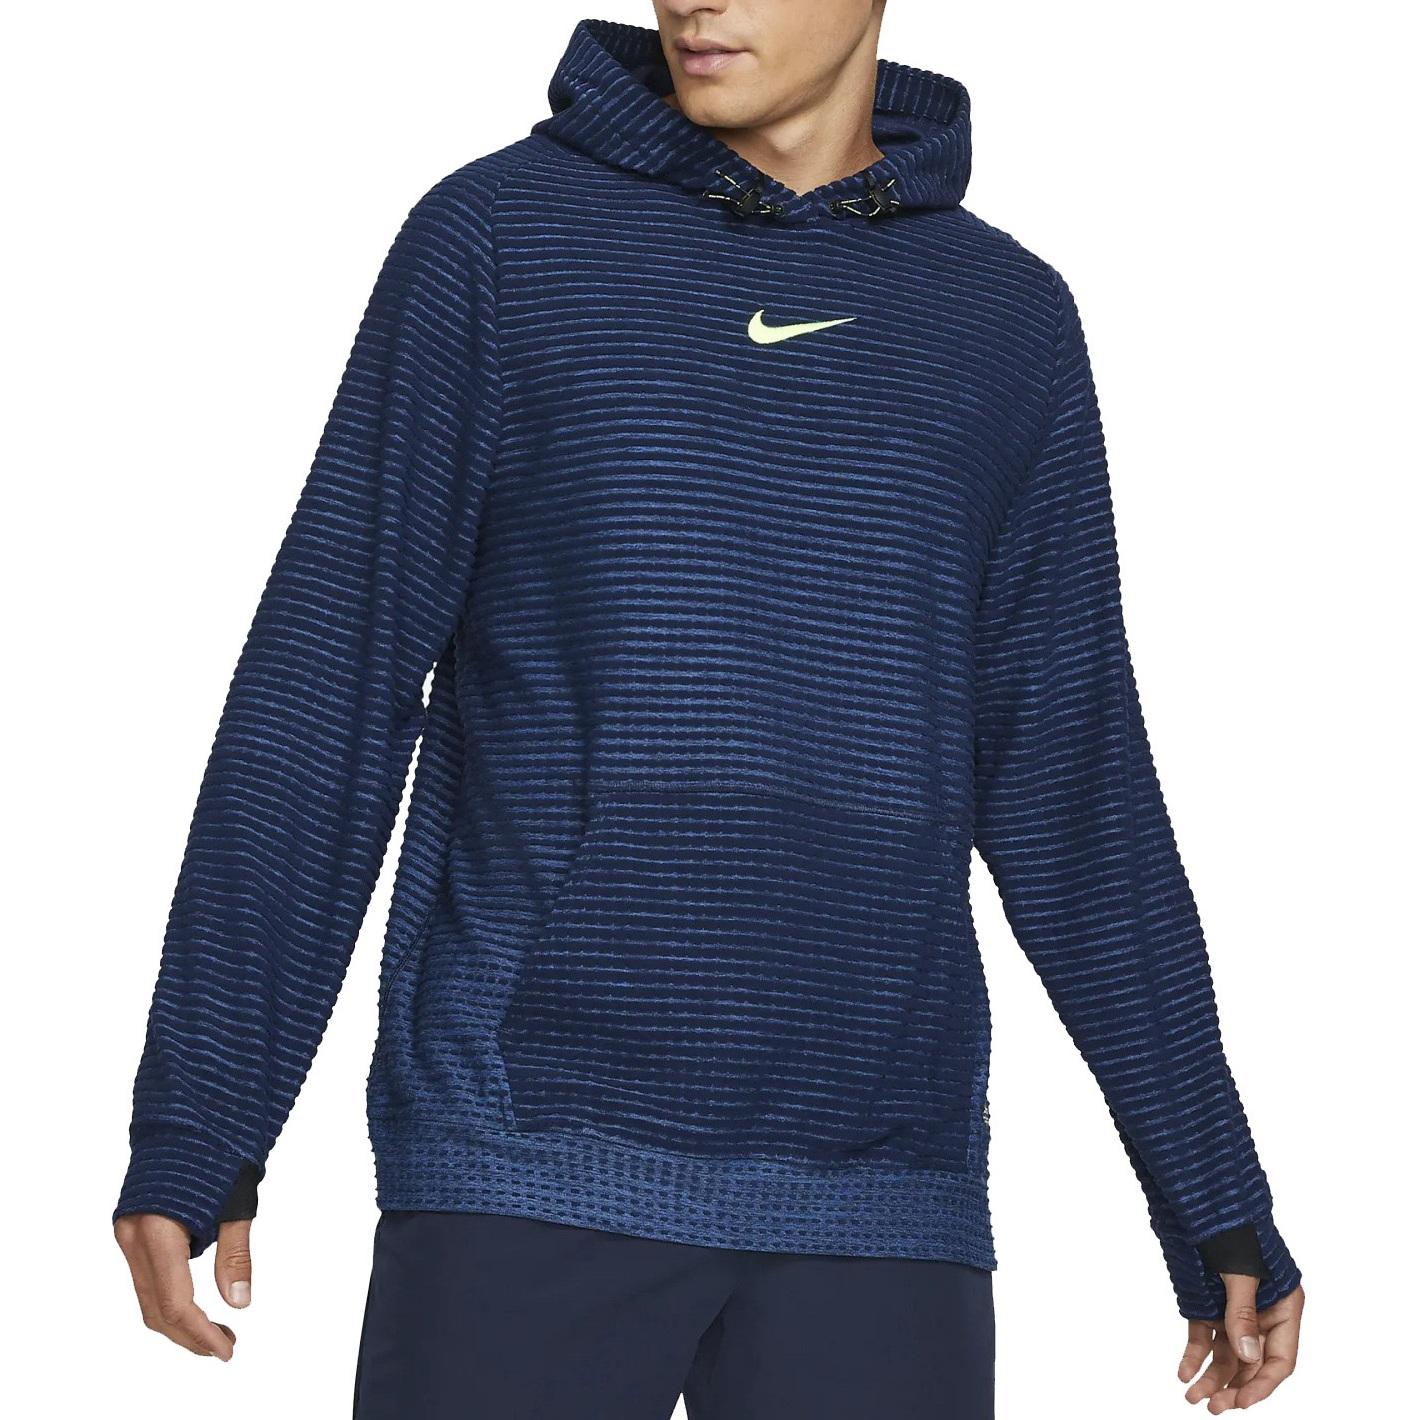 Foto de Nike Pro Therma-Fit ADV Fleece Sudadera con Capucha para Hombre - obsidian/court blue/volt DD1707-451